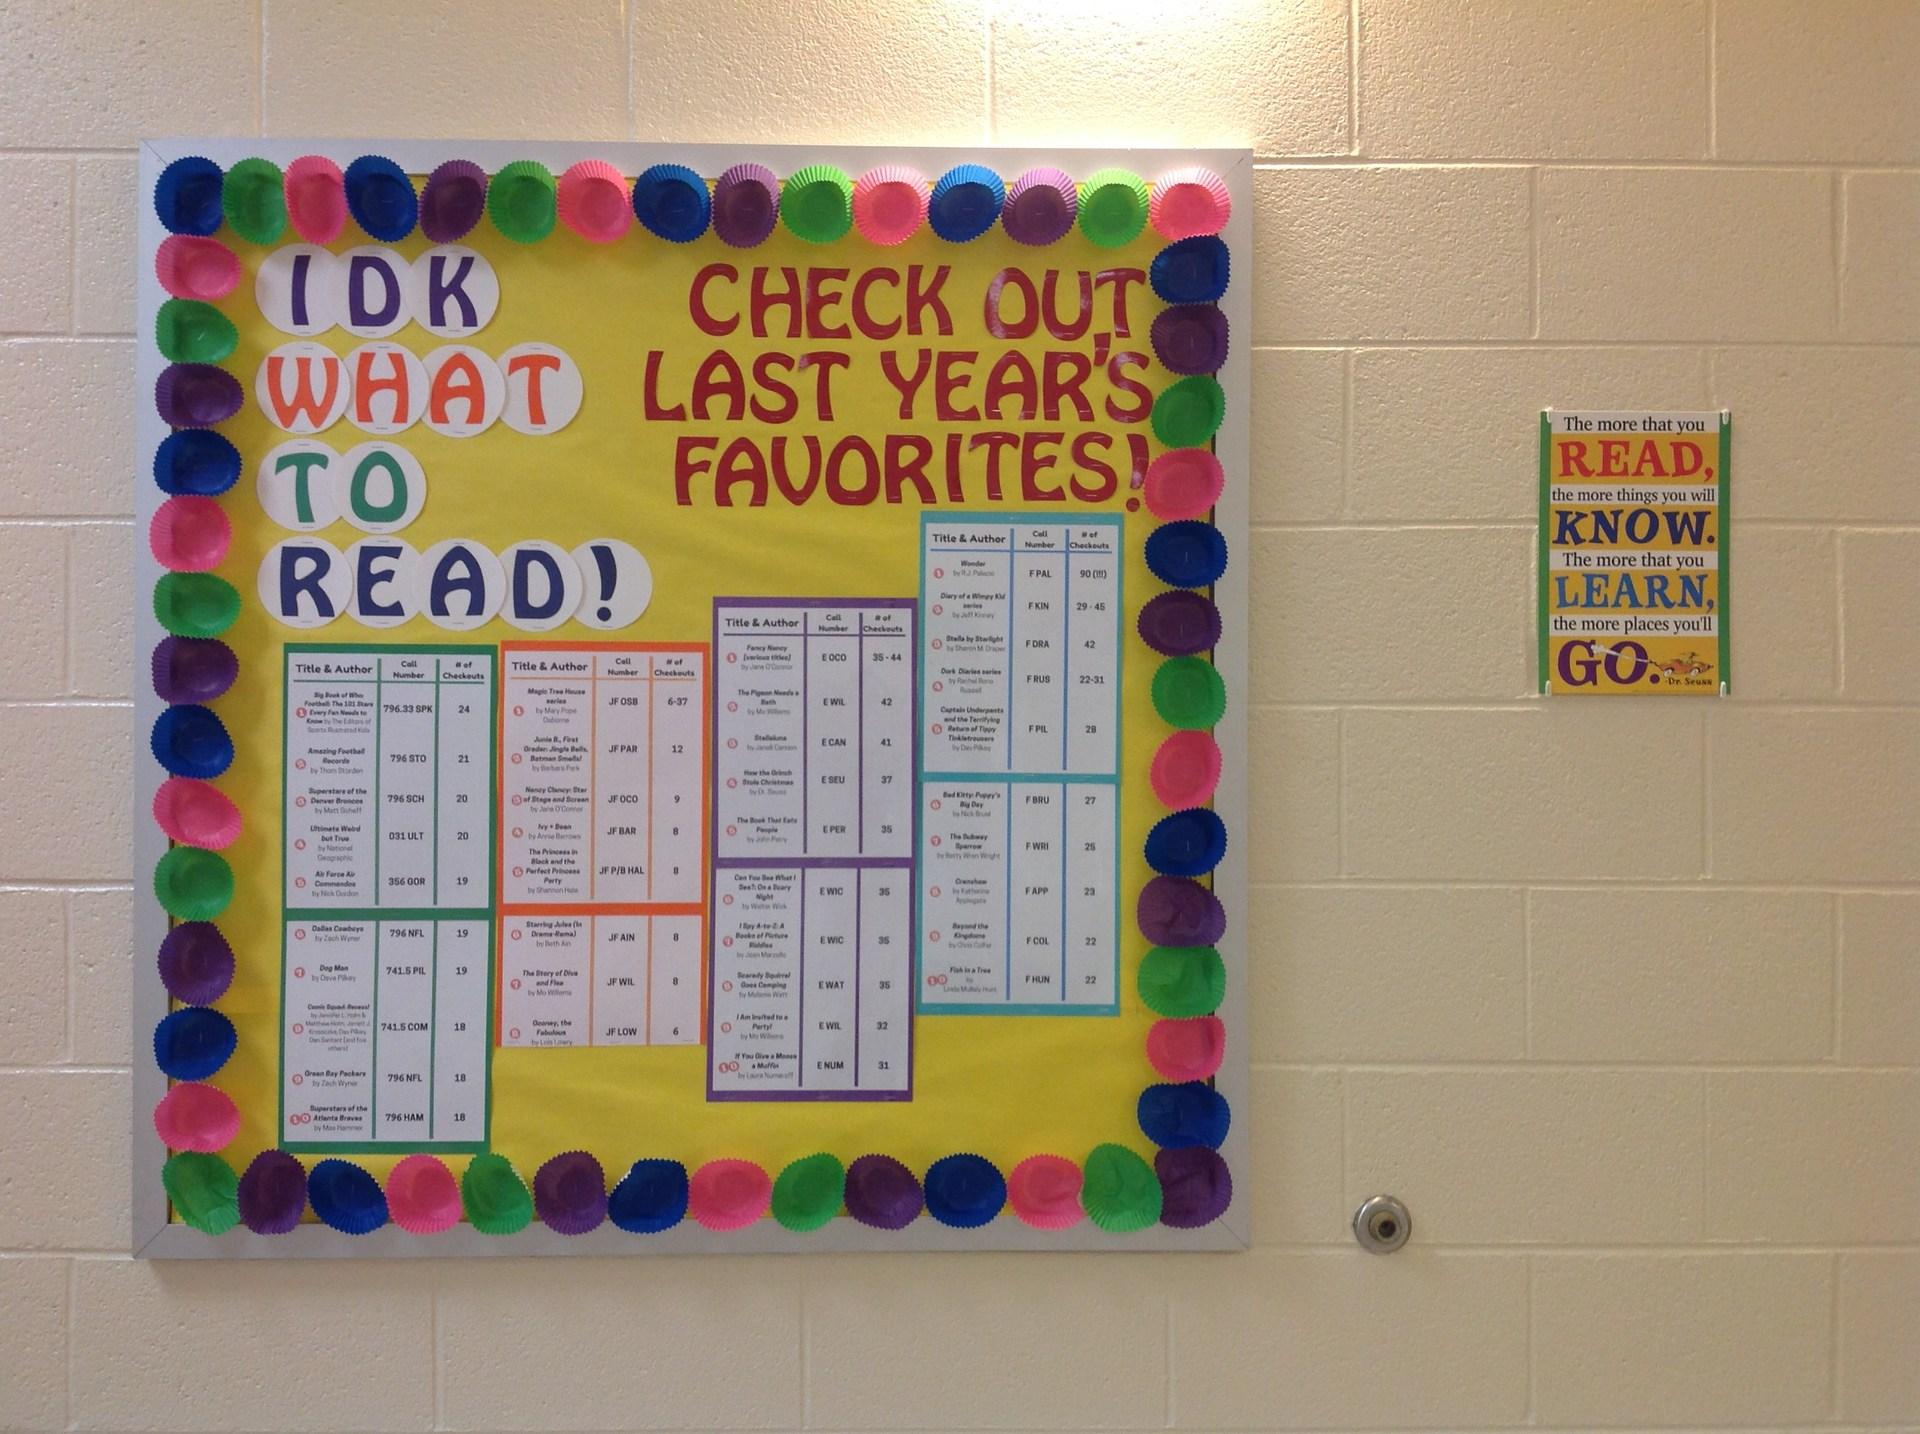 IDK What to Read bulletin board